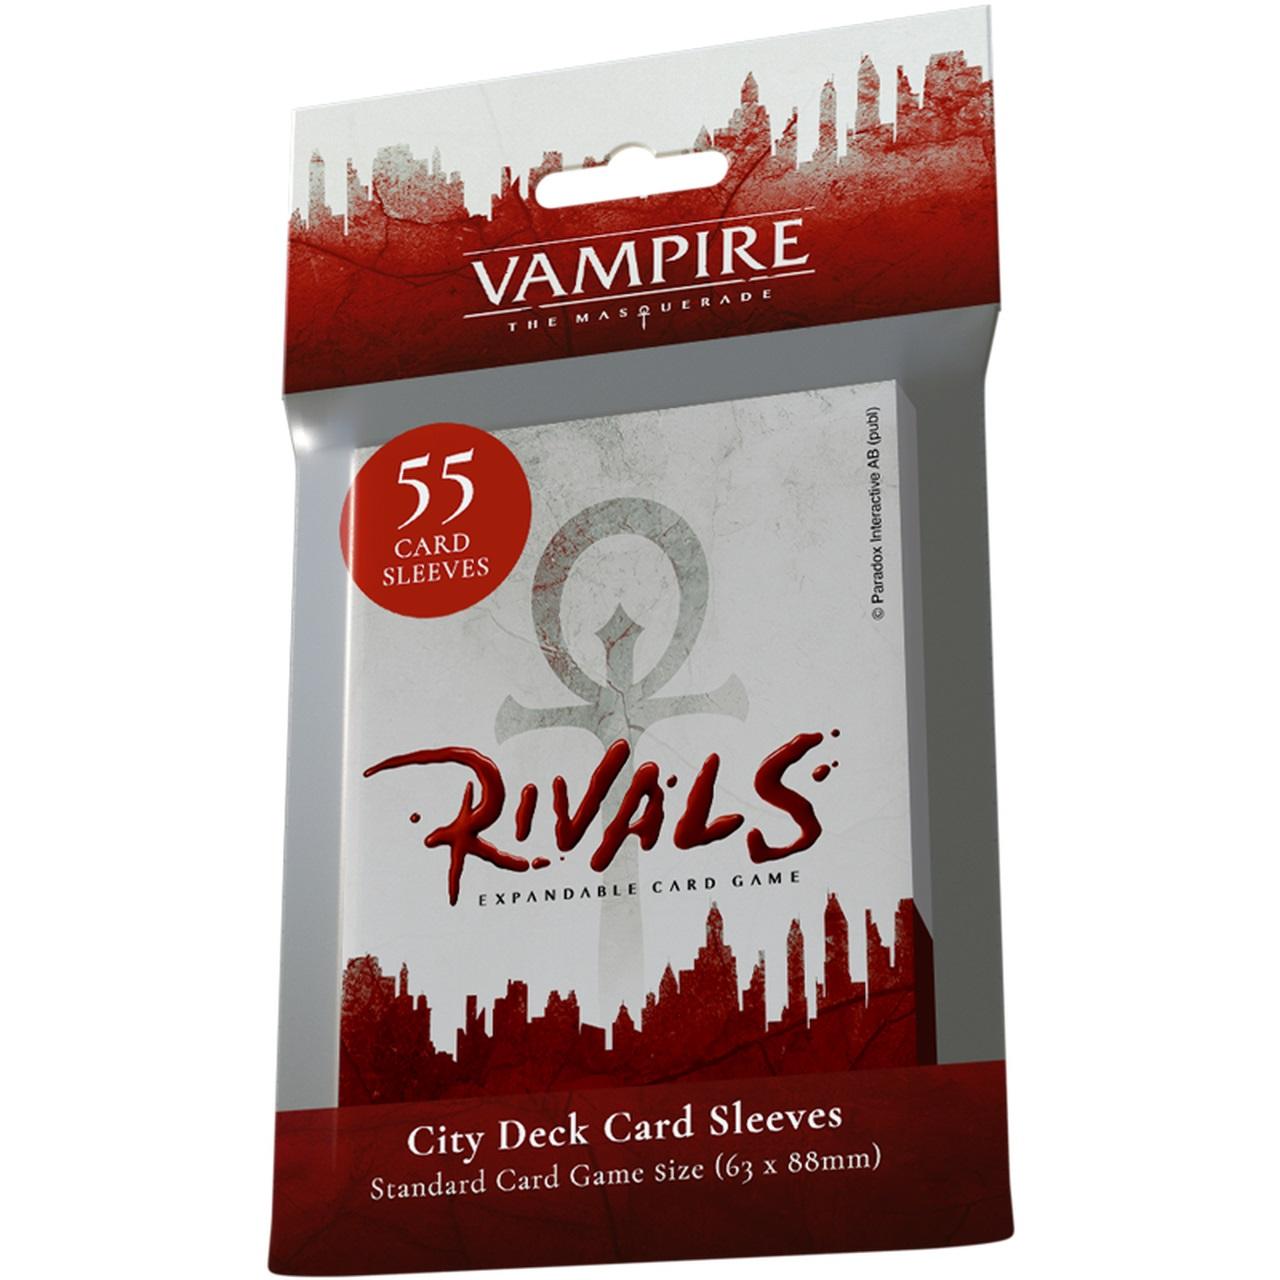 Vampire: The Masquerade - Rivals City Deck Sleeves